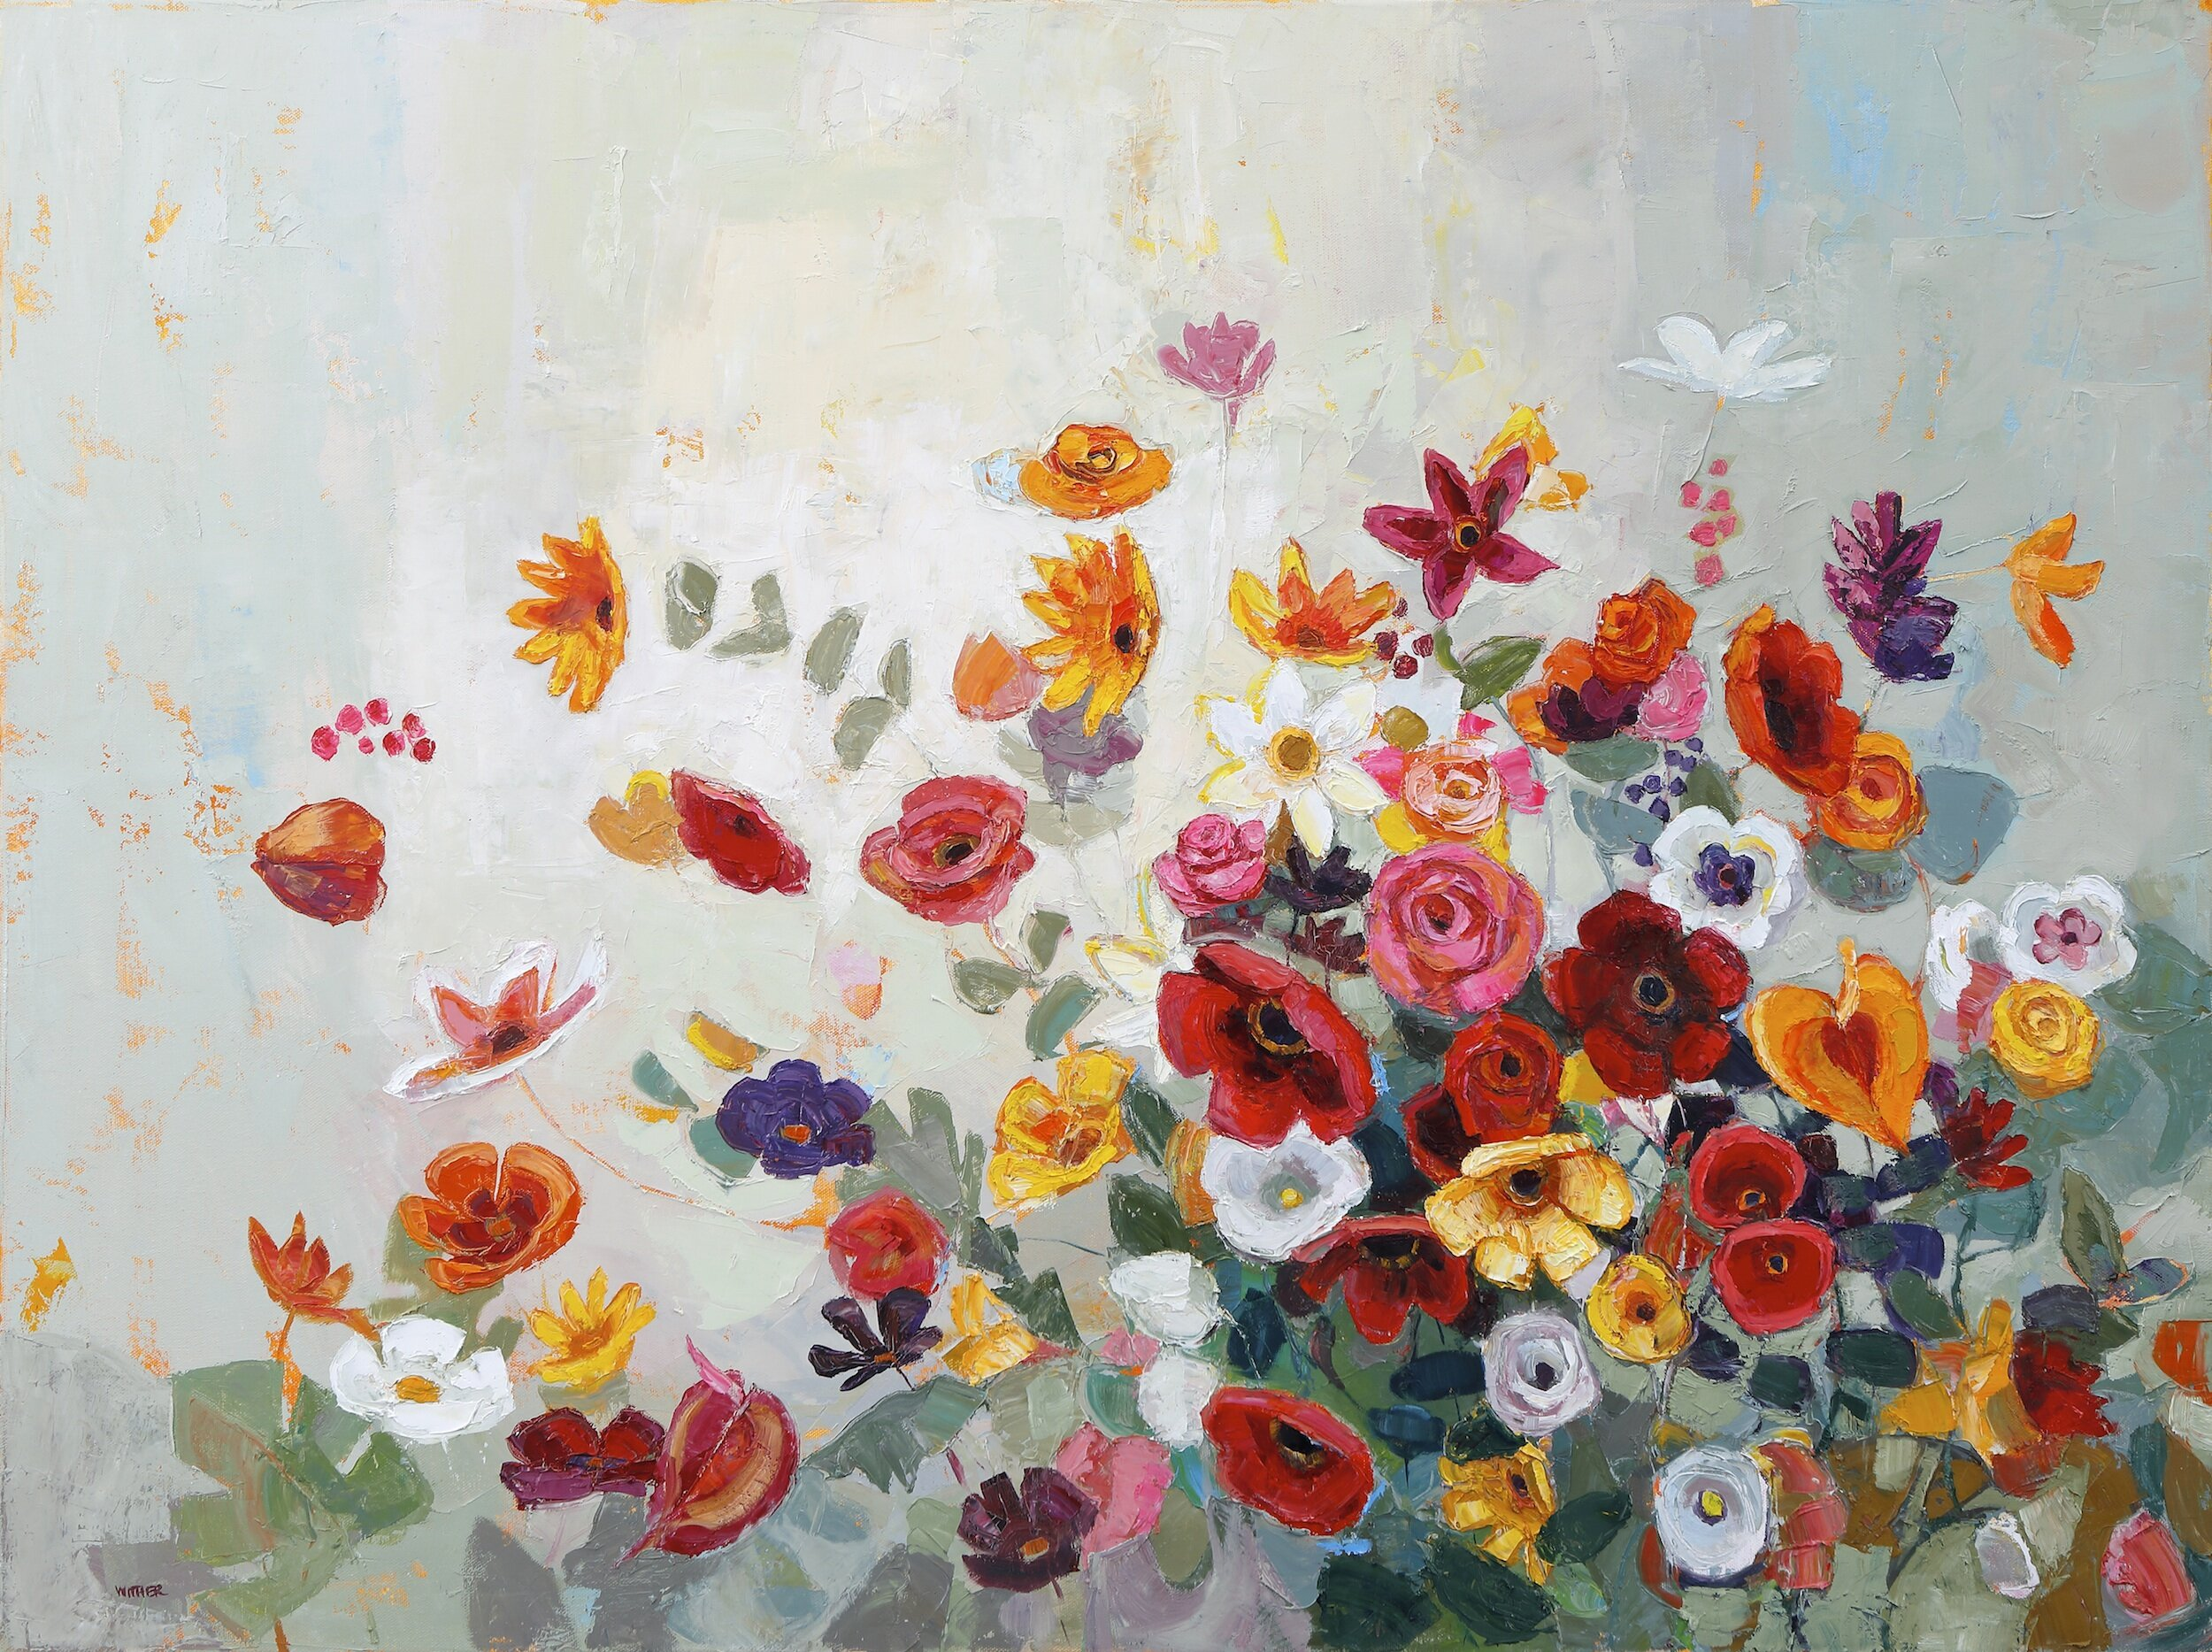 Title: Burst of Exuberance  Size:  30x40in  Medium: Oil on Canvas  Price: £5450